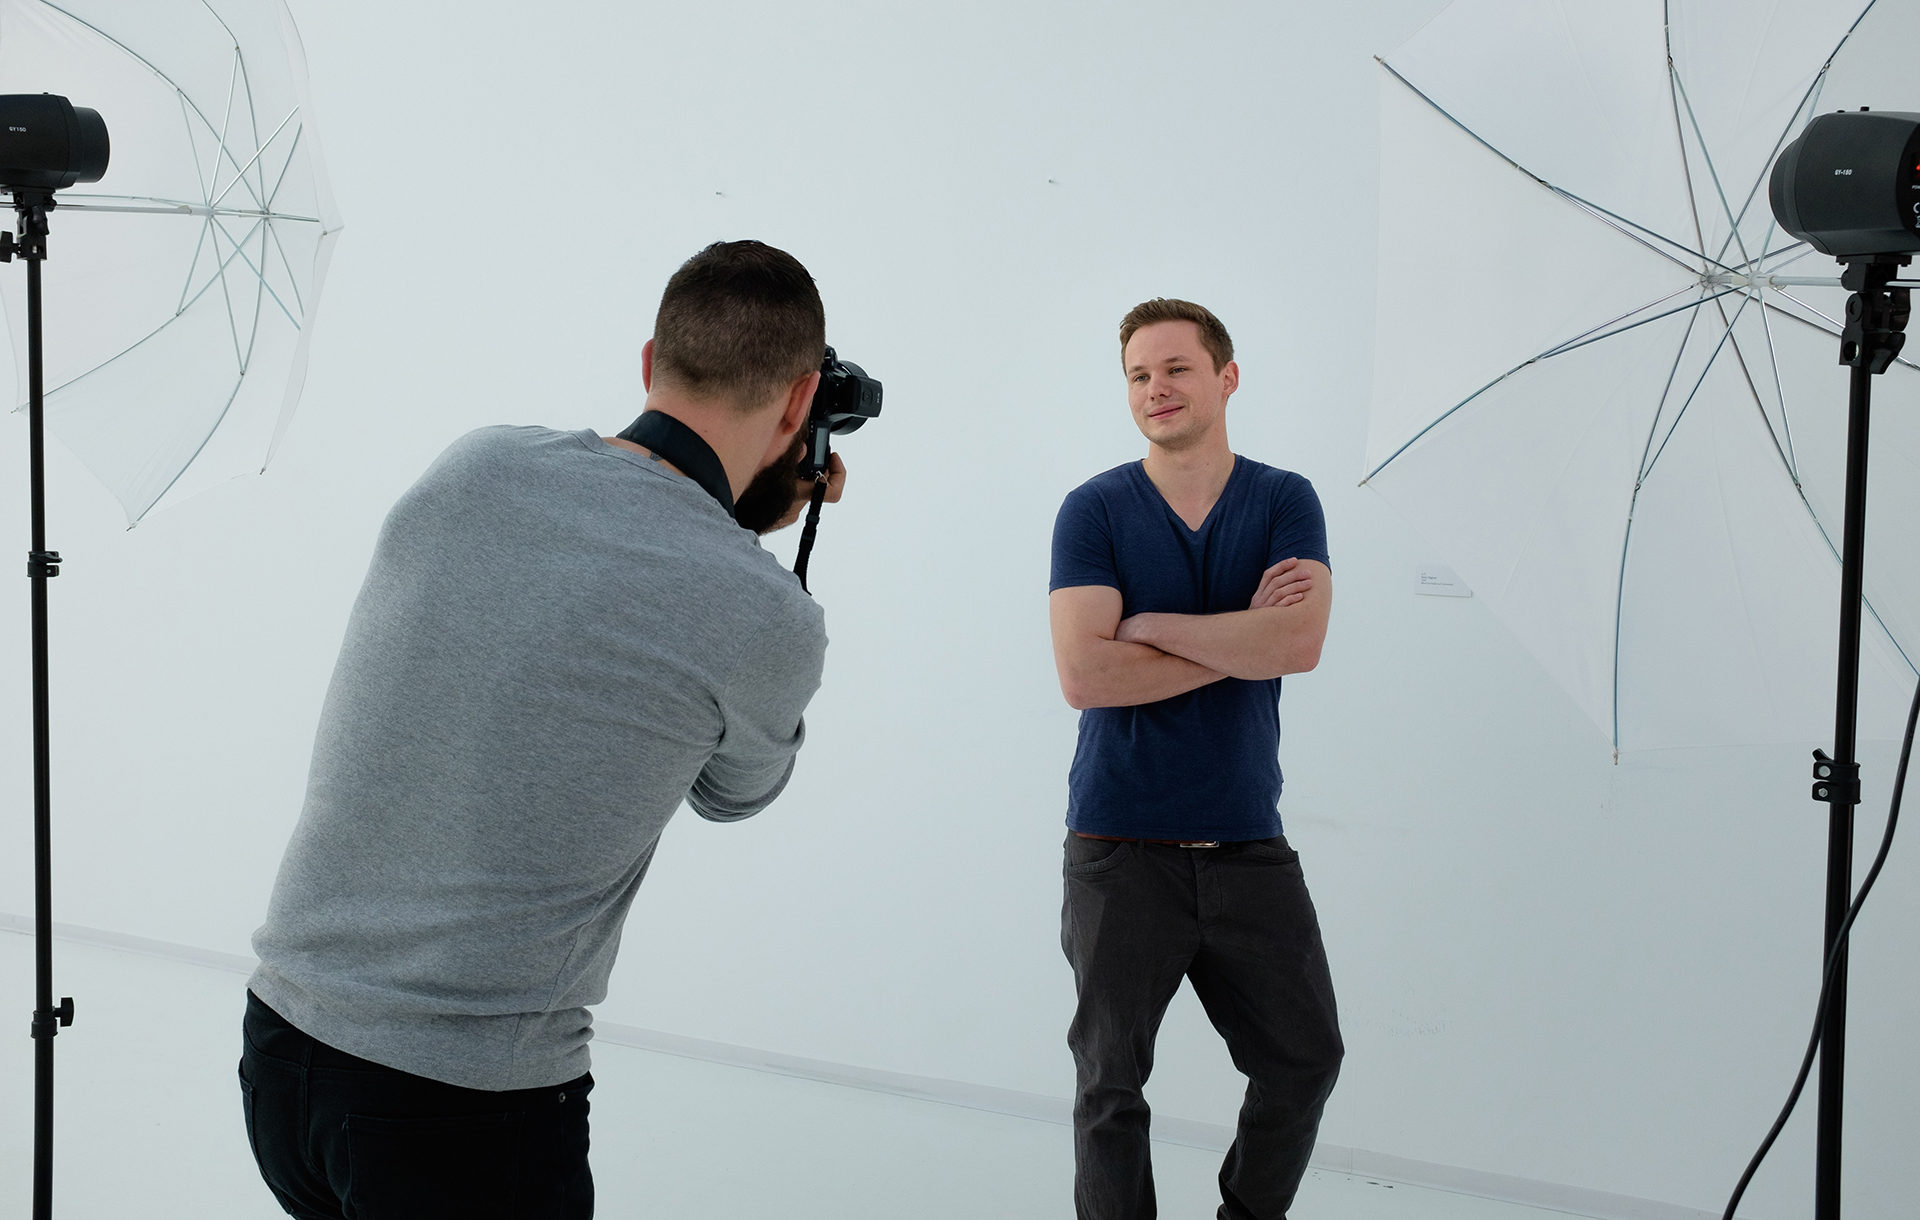 Fotograf fotografiert ein Model